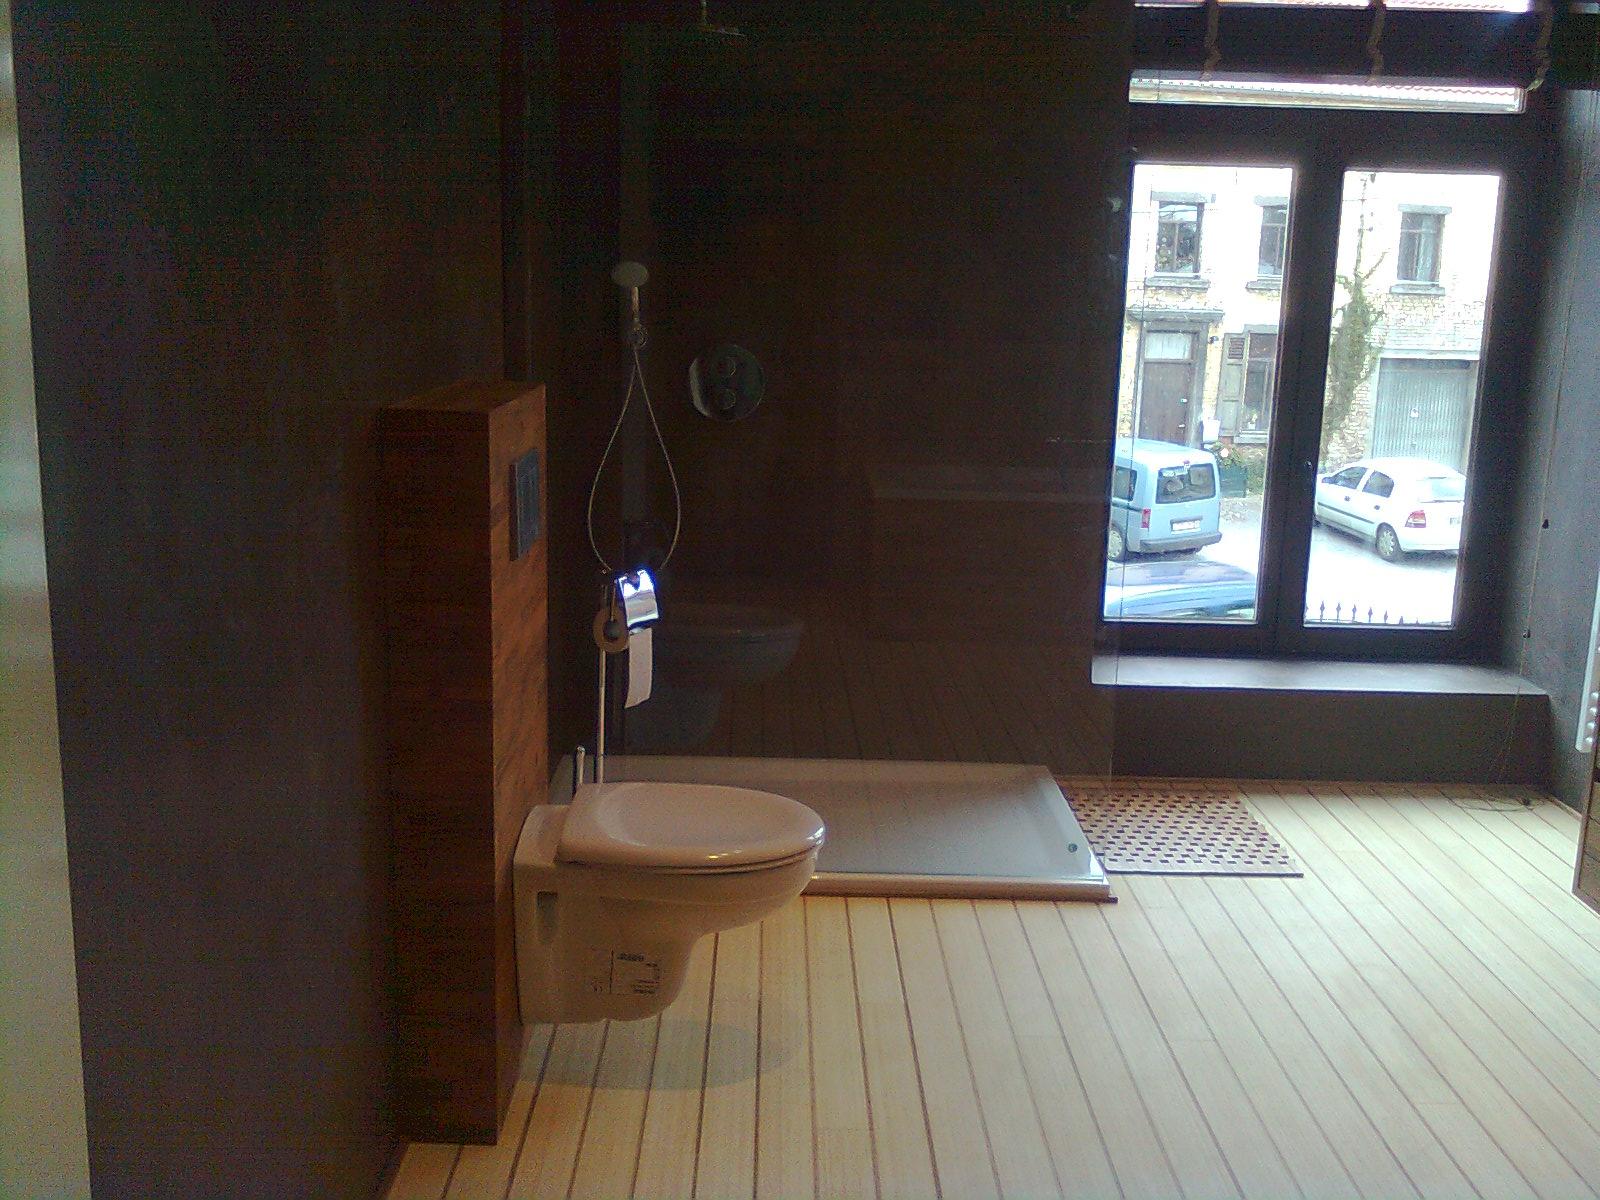 Parquet salle de bain - Parquet salle bain ...